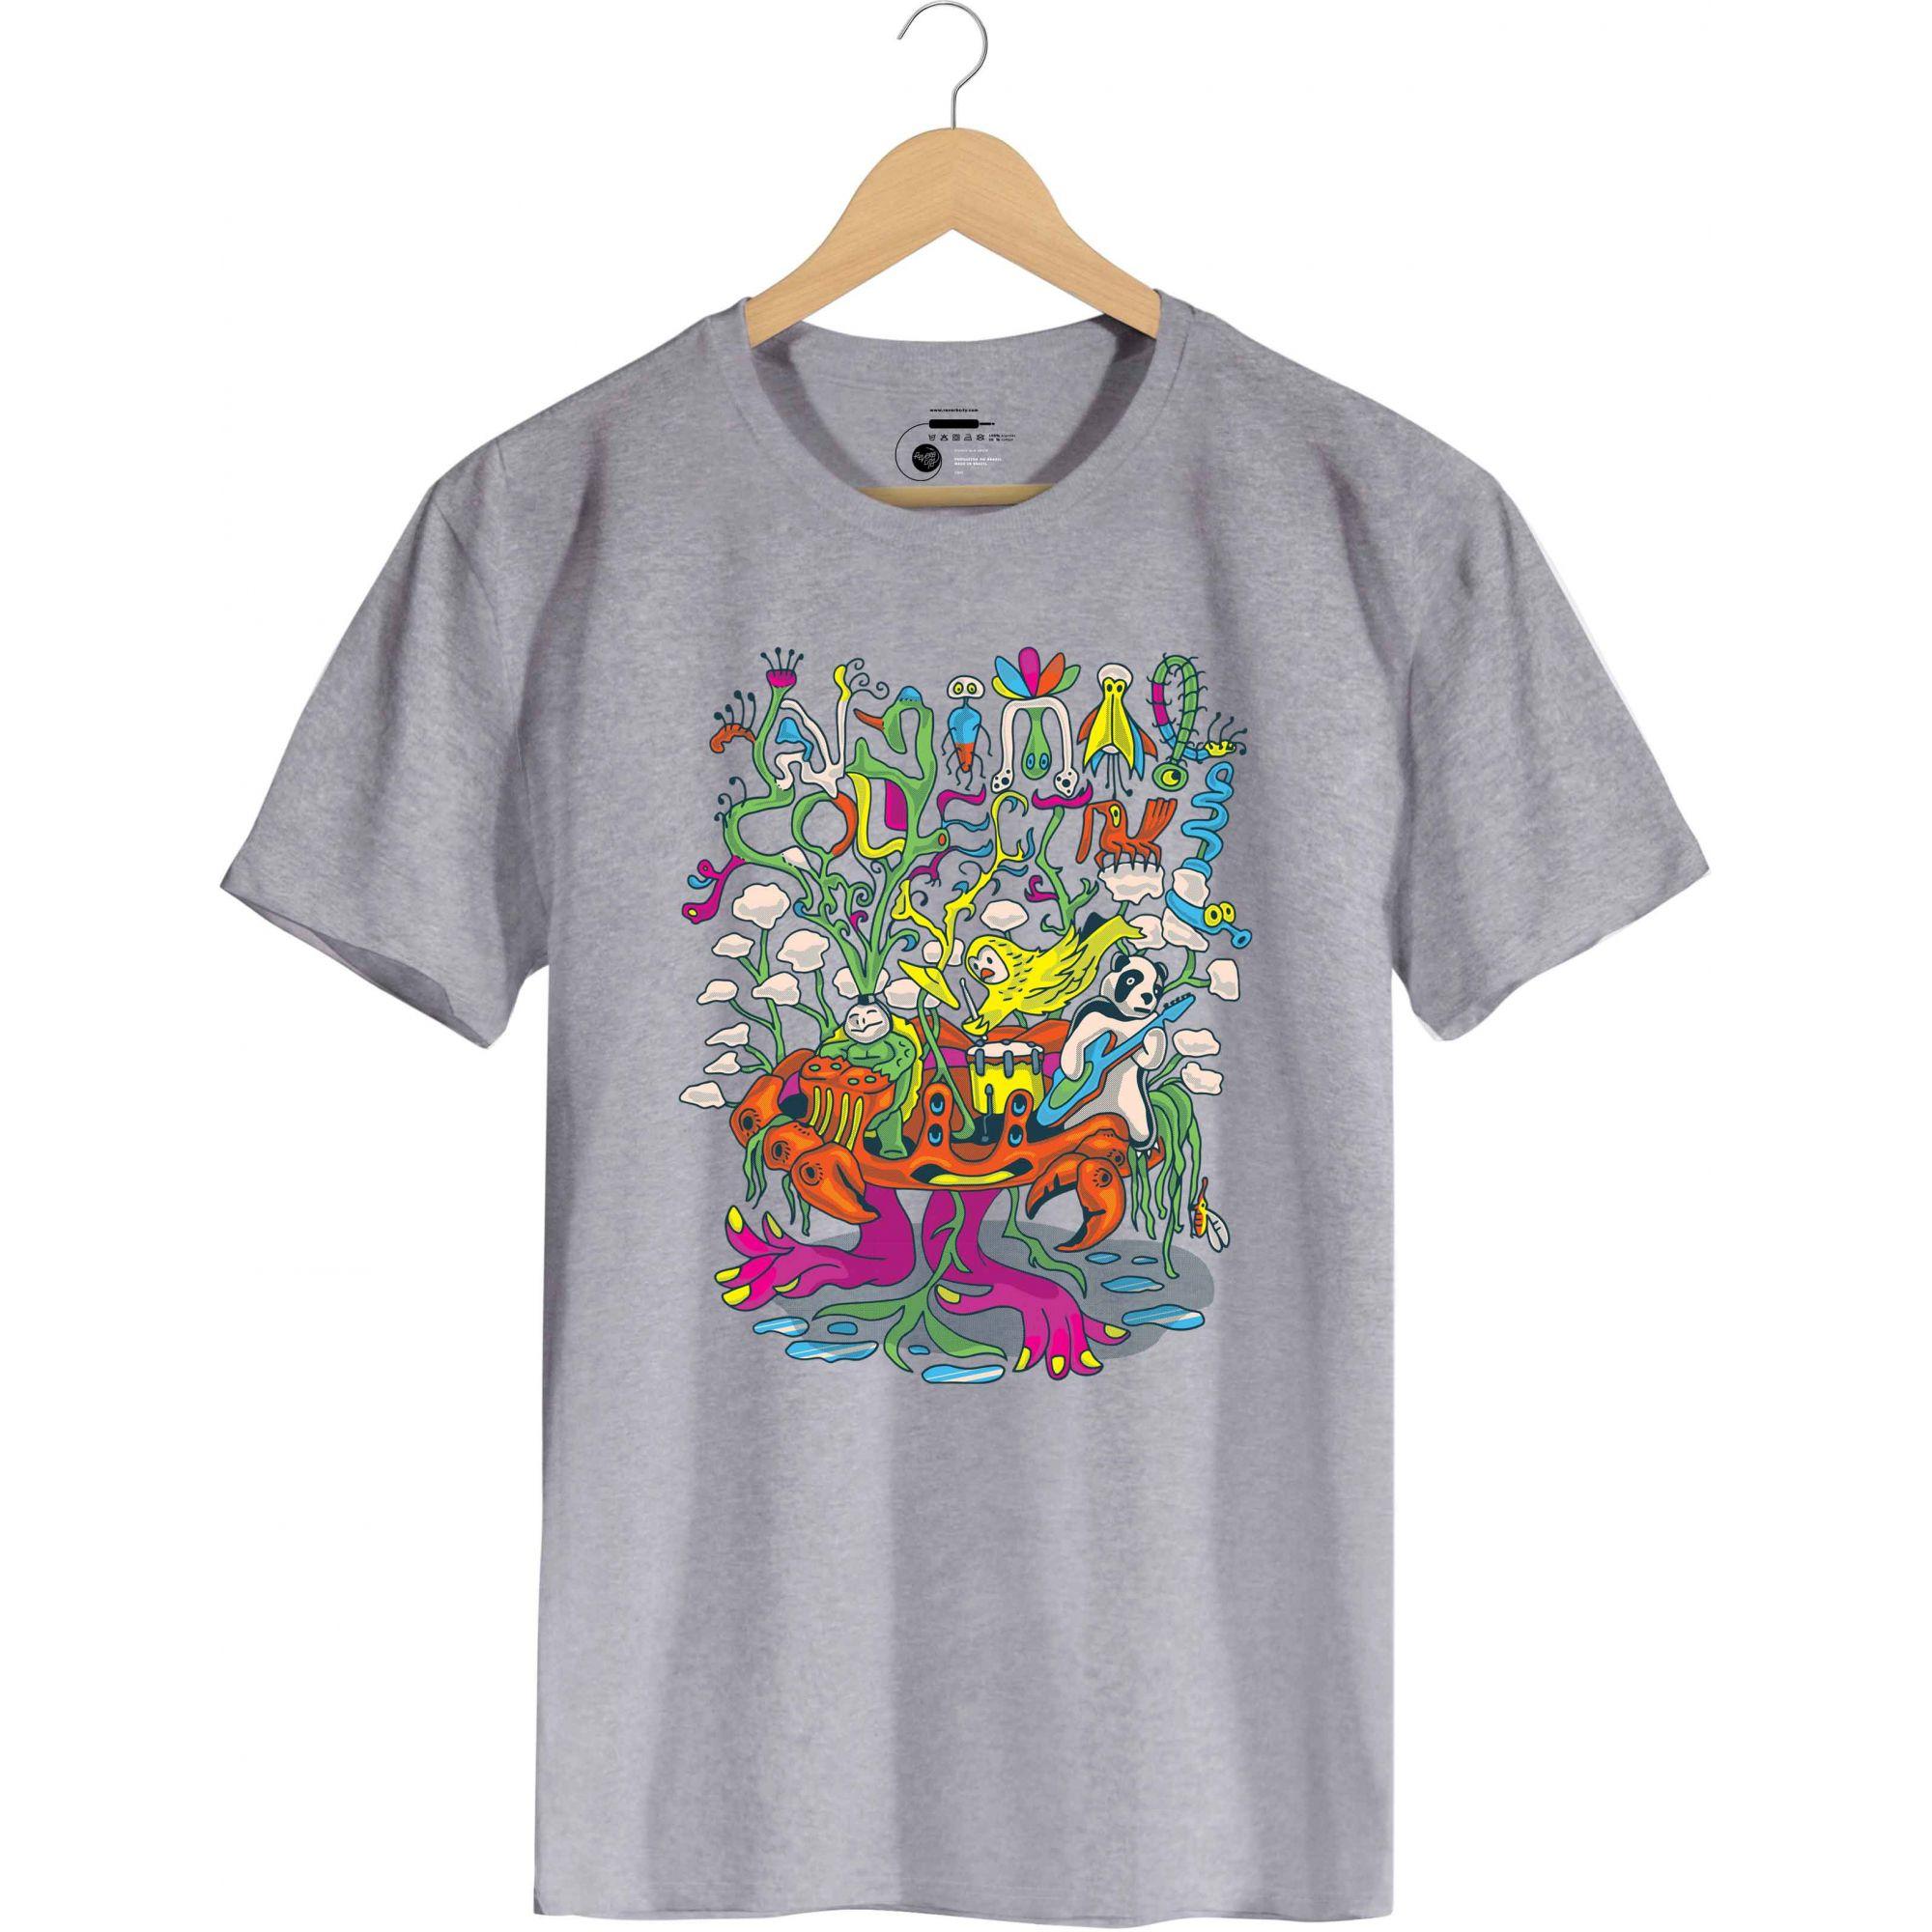 Camiseta Animal Collective - Masculino